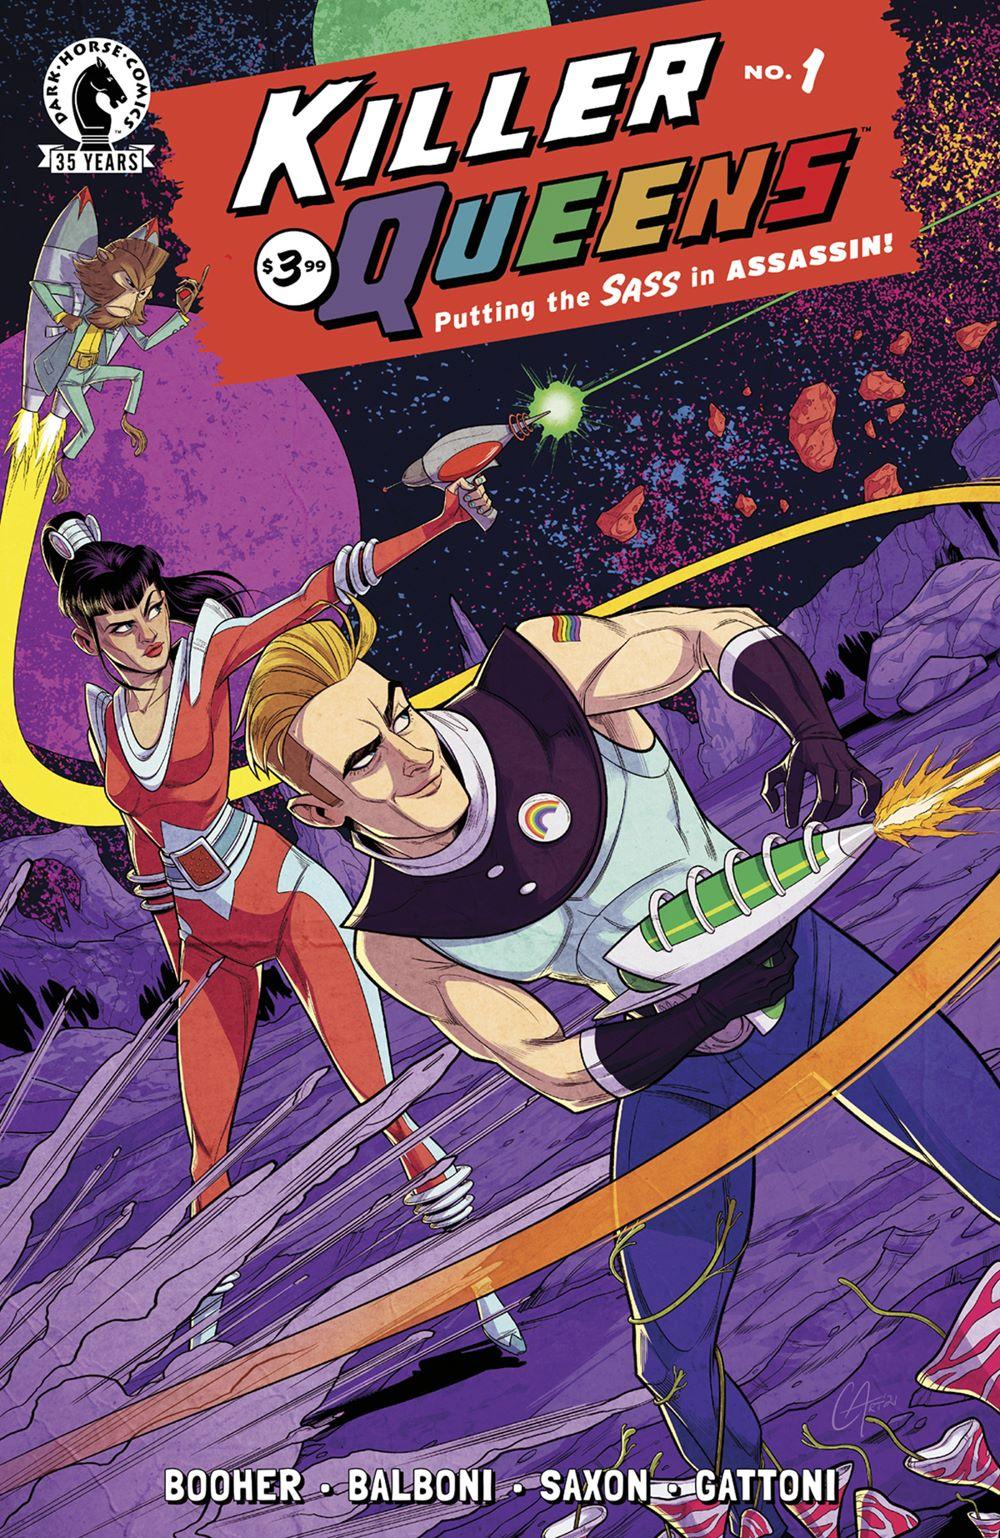 KQNS_i1_CVR-B-VARIANT_CVR_4x6_SOL-3 Dark Horse Comics August 2021 Solicitations